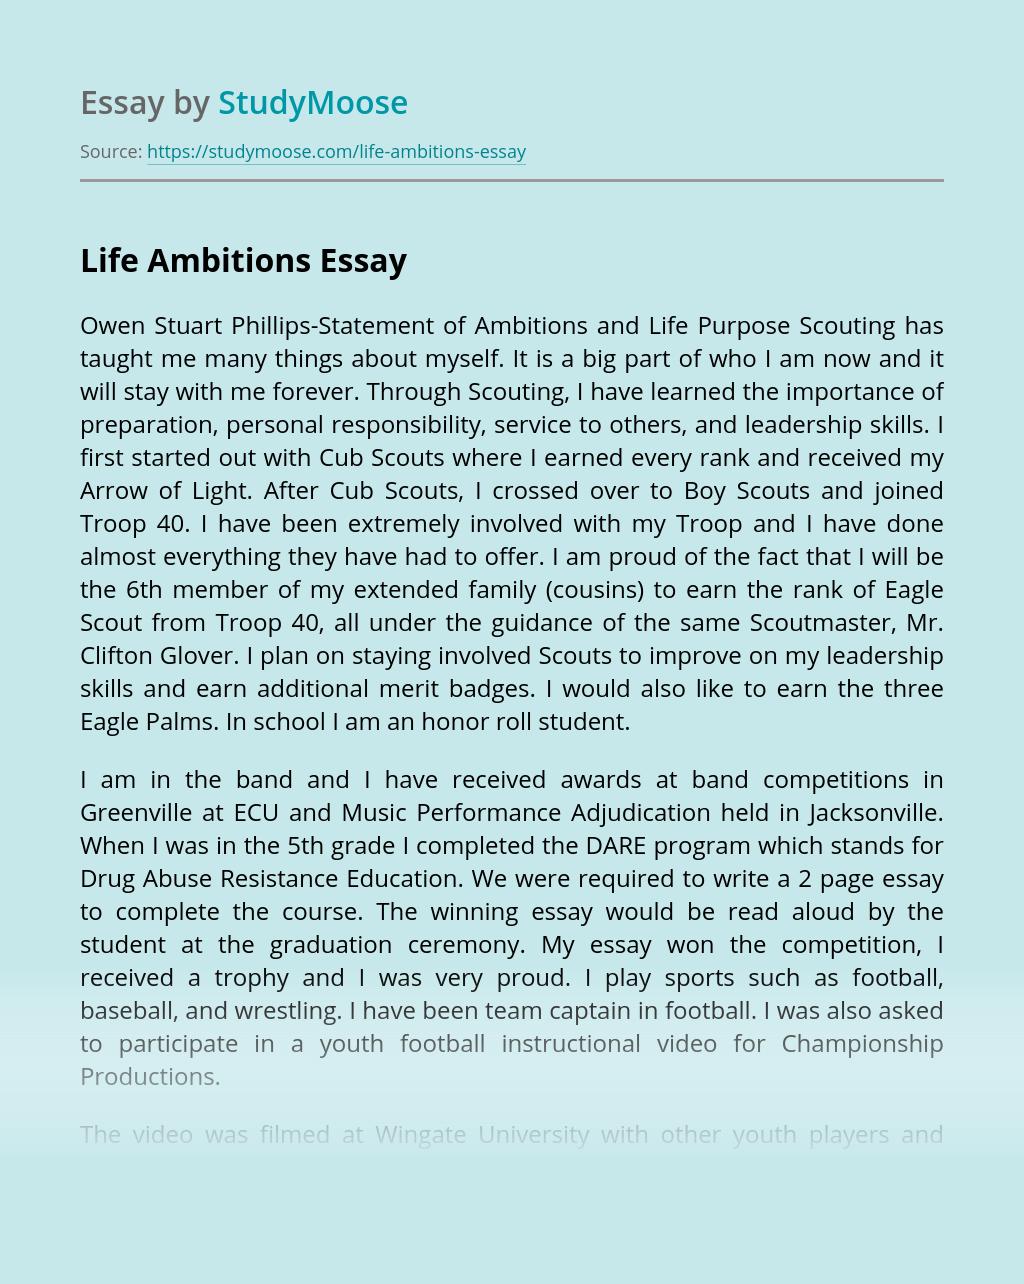 Life Ambitions